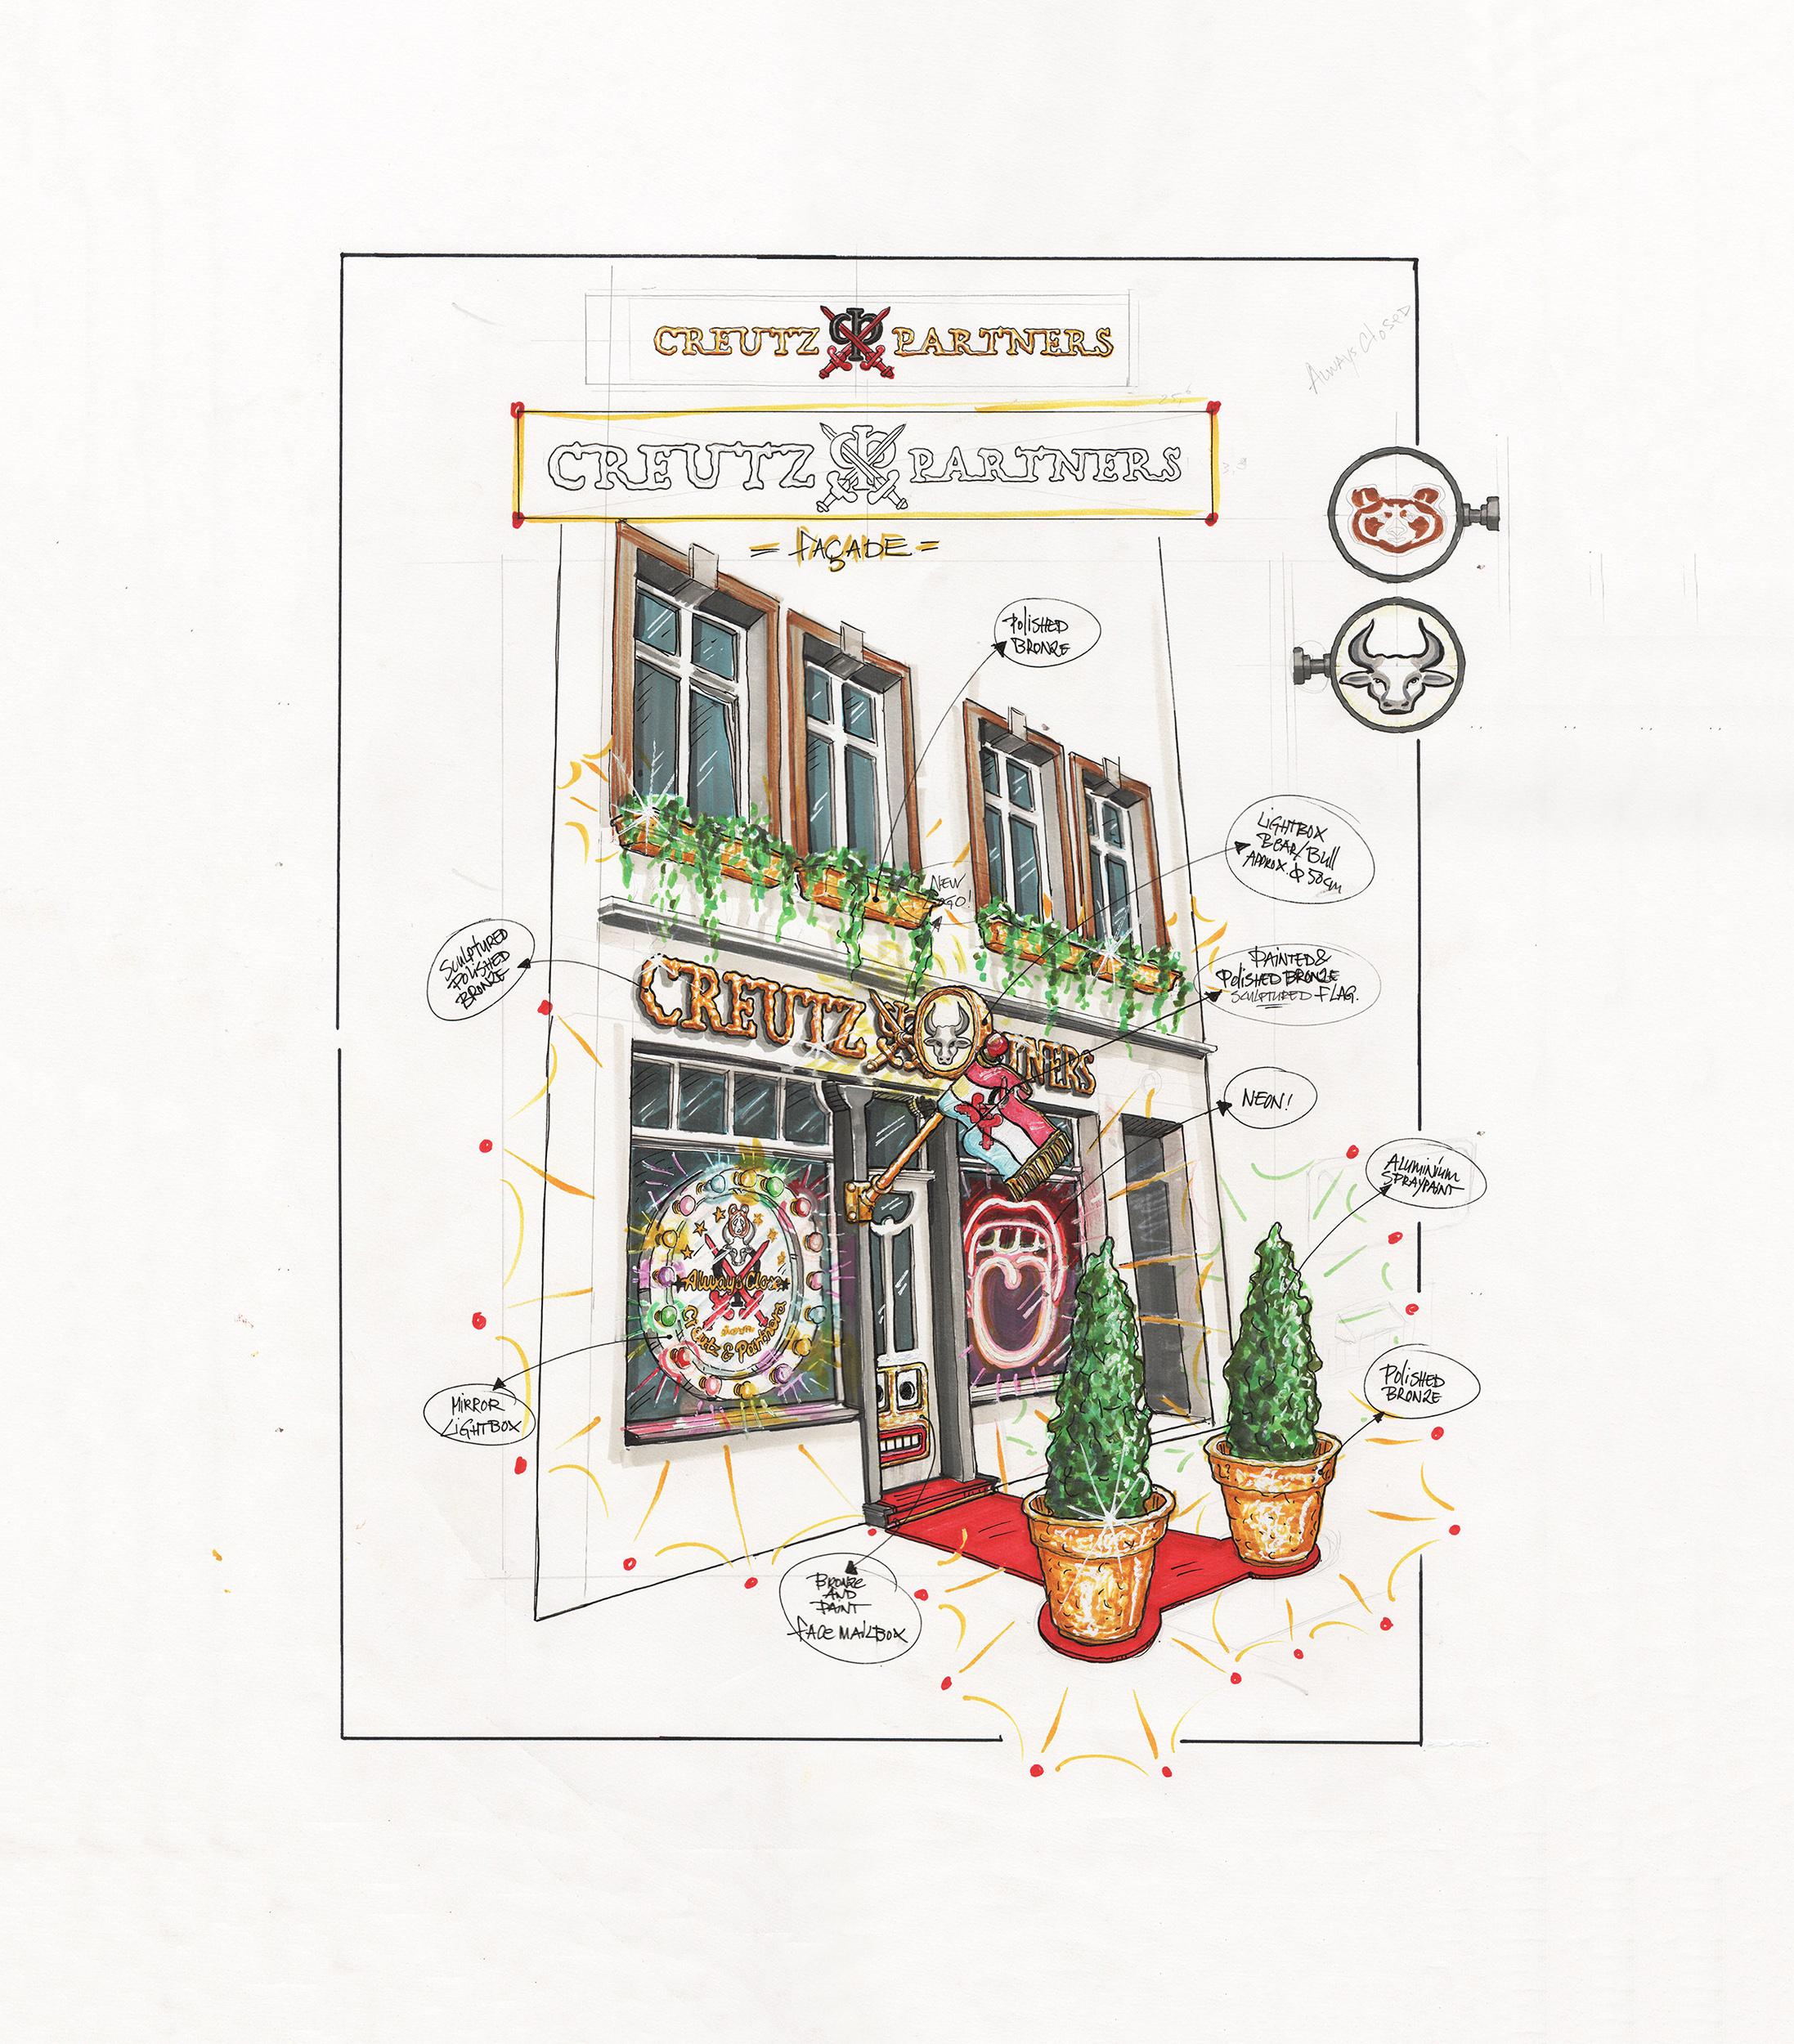 Studio Job drawing Creutz & Partners